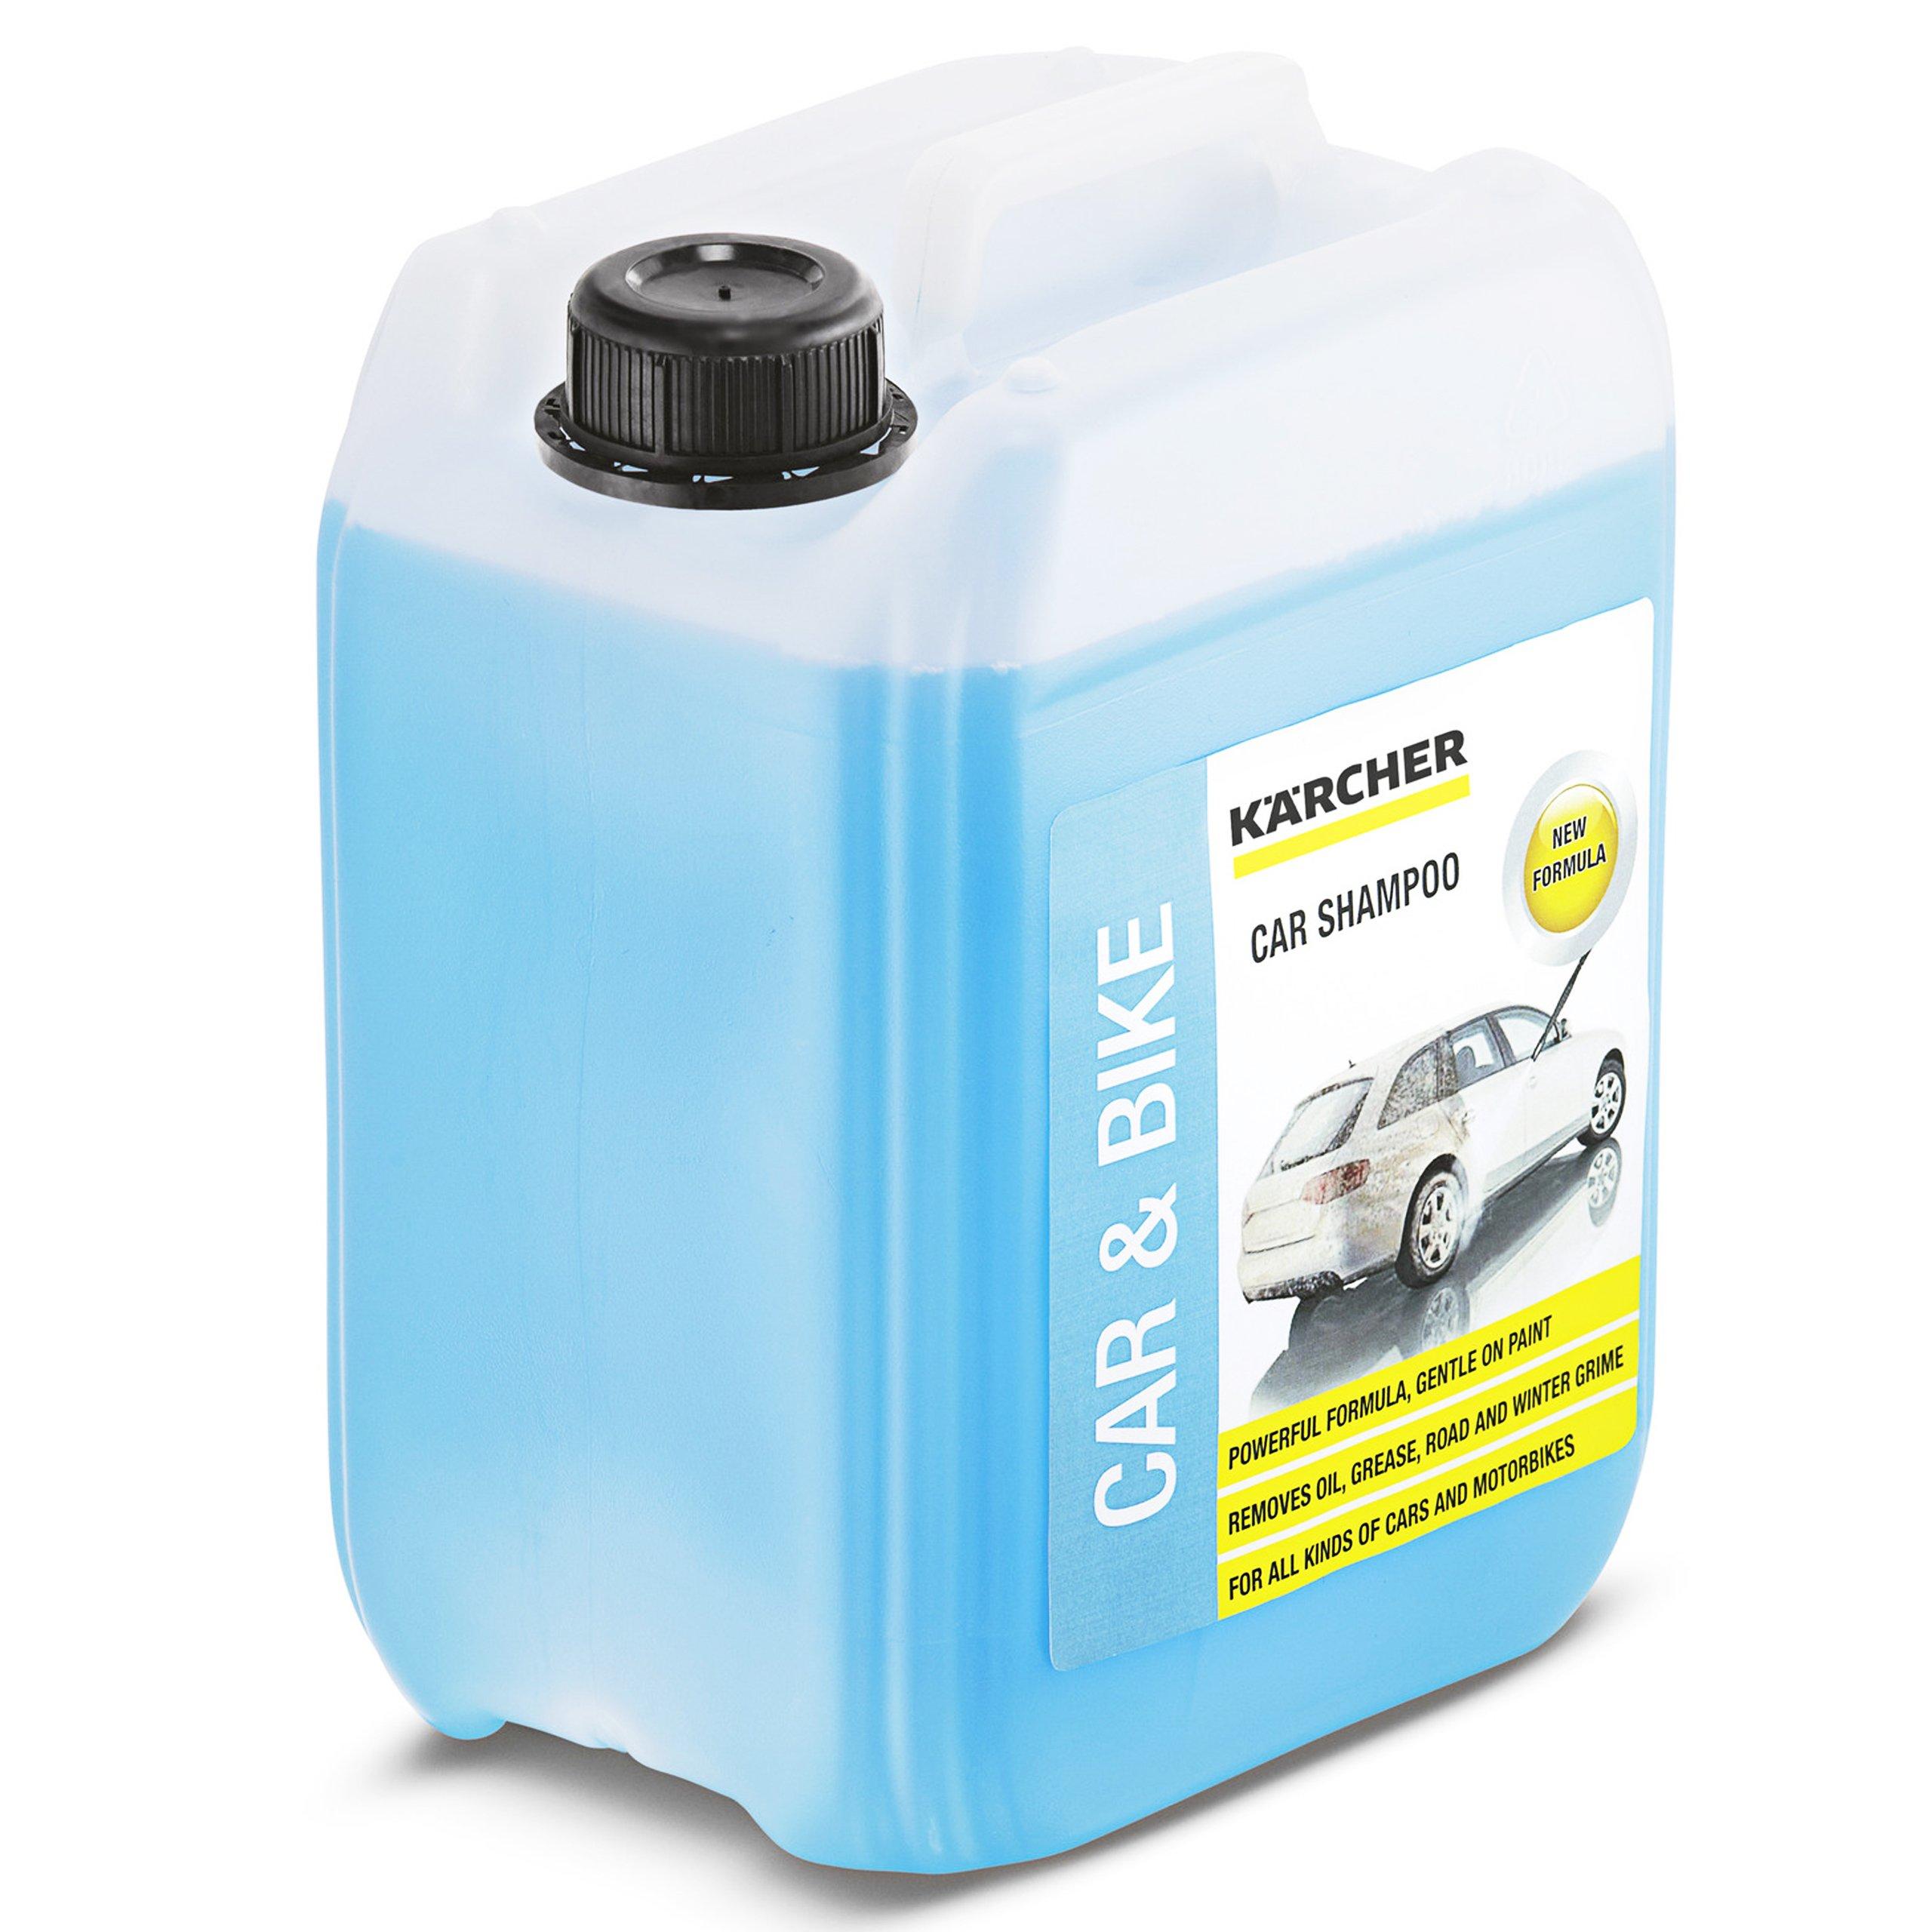 KARCHER RM619 автомобильный Шампунь 5Л для мытья автомобиля